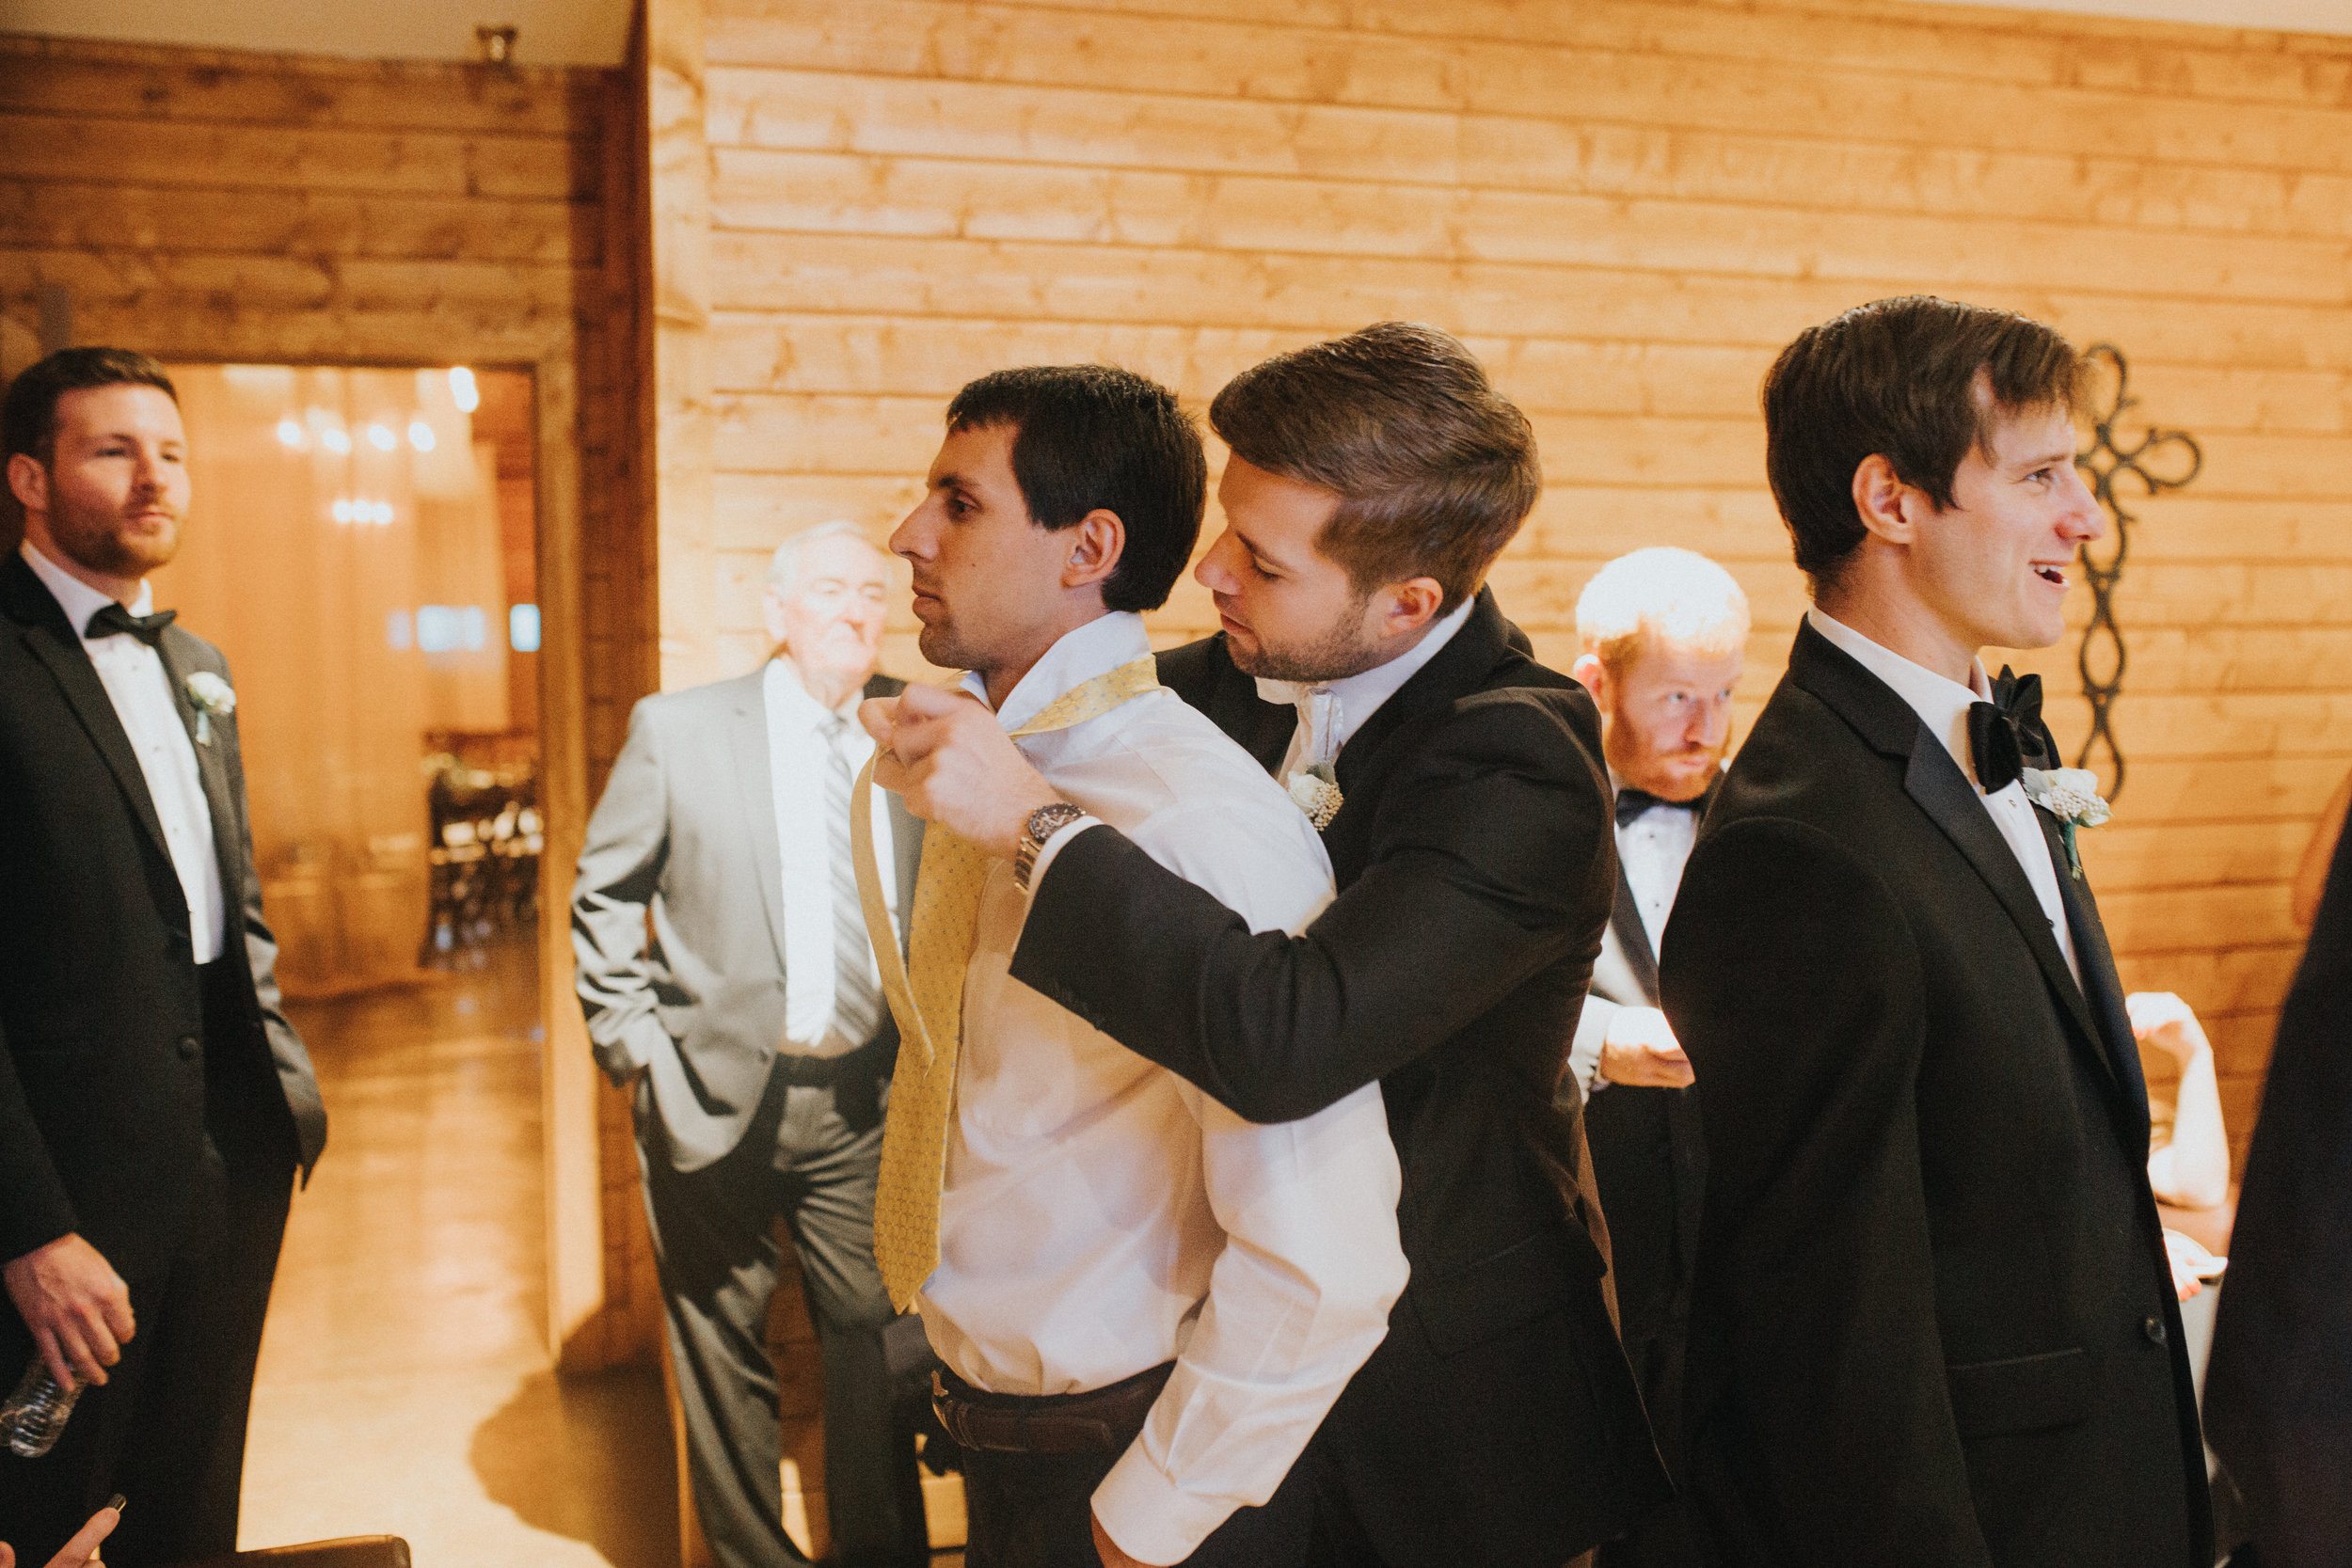 WeddingtonWedding0372.jpg